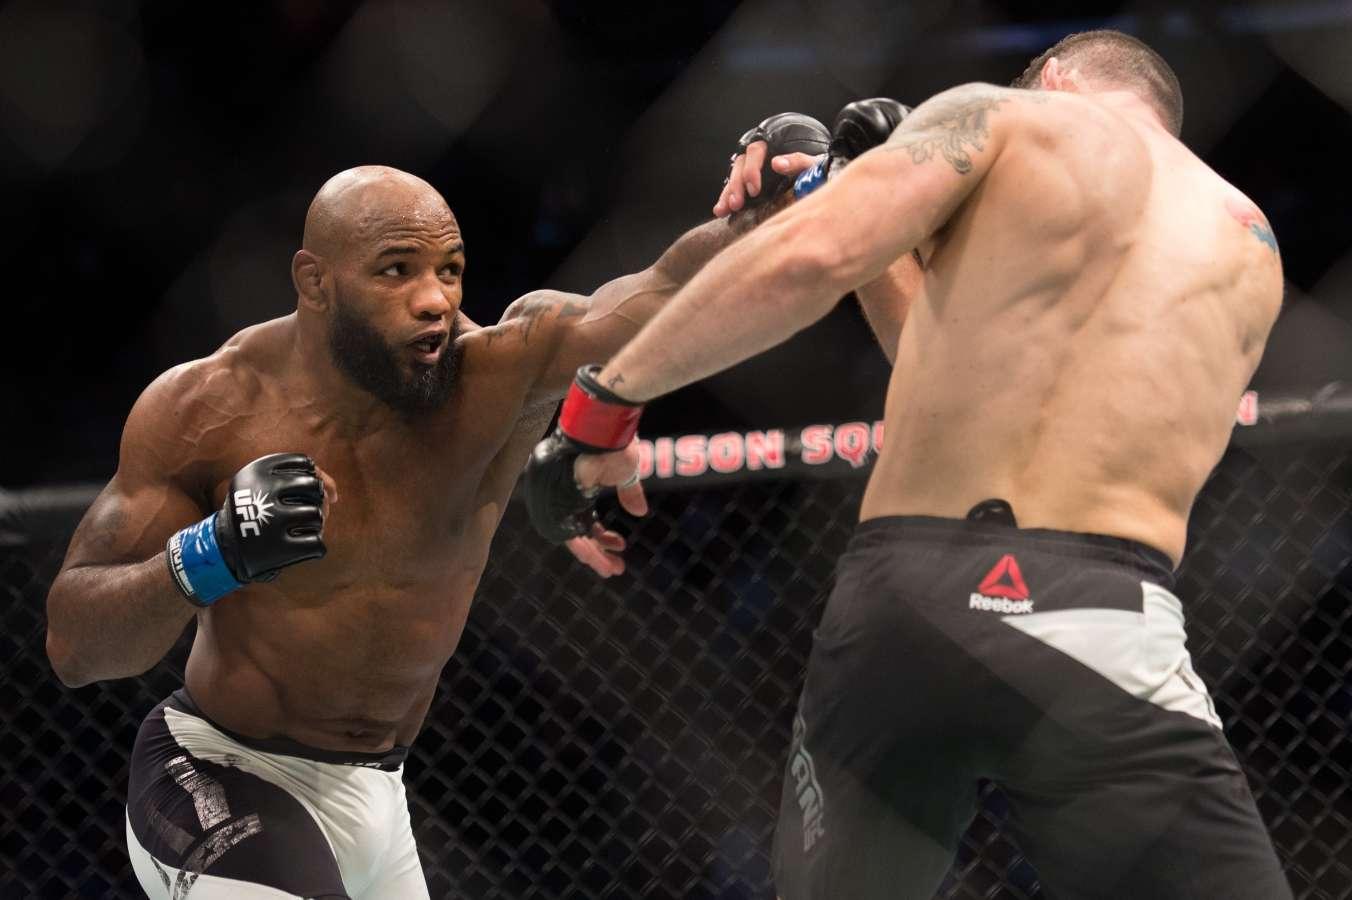 UFC 221: Luke Rockhold vs Yoel Romero